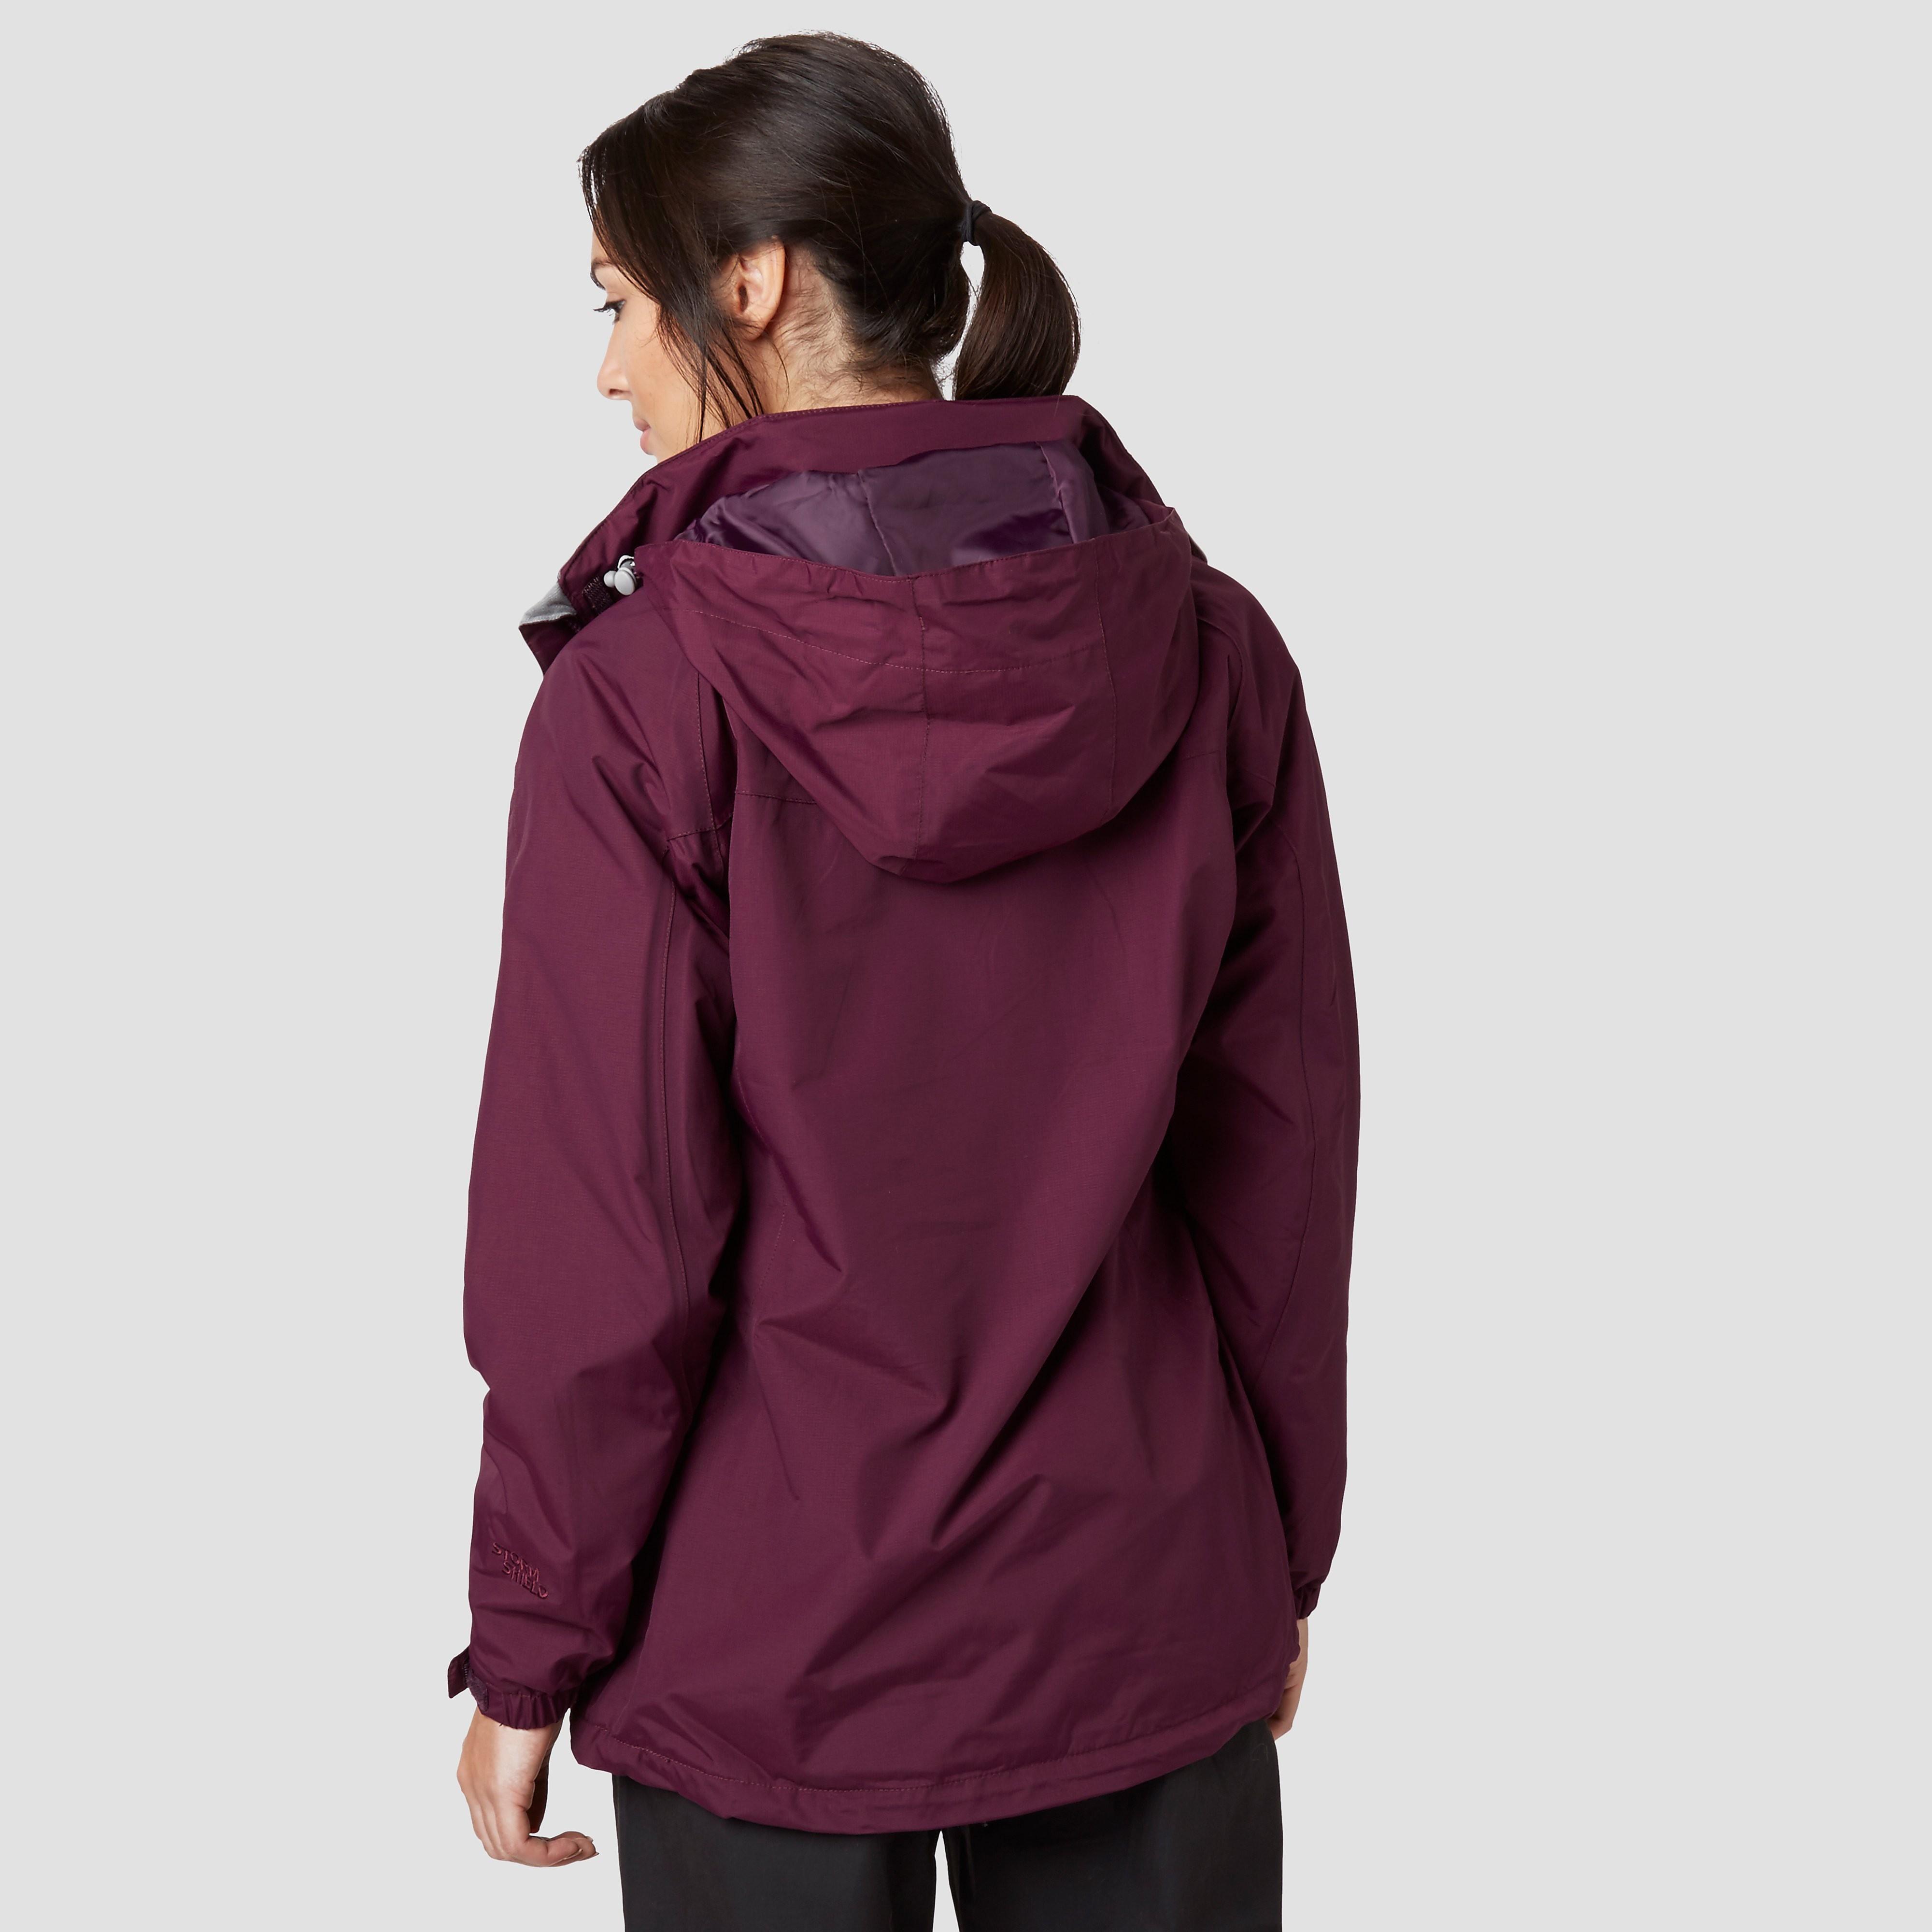 Peter Storm Women's Lakeside 3 in 1 Jacket